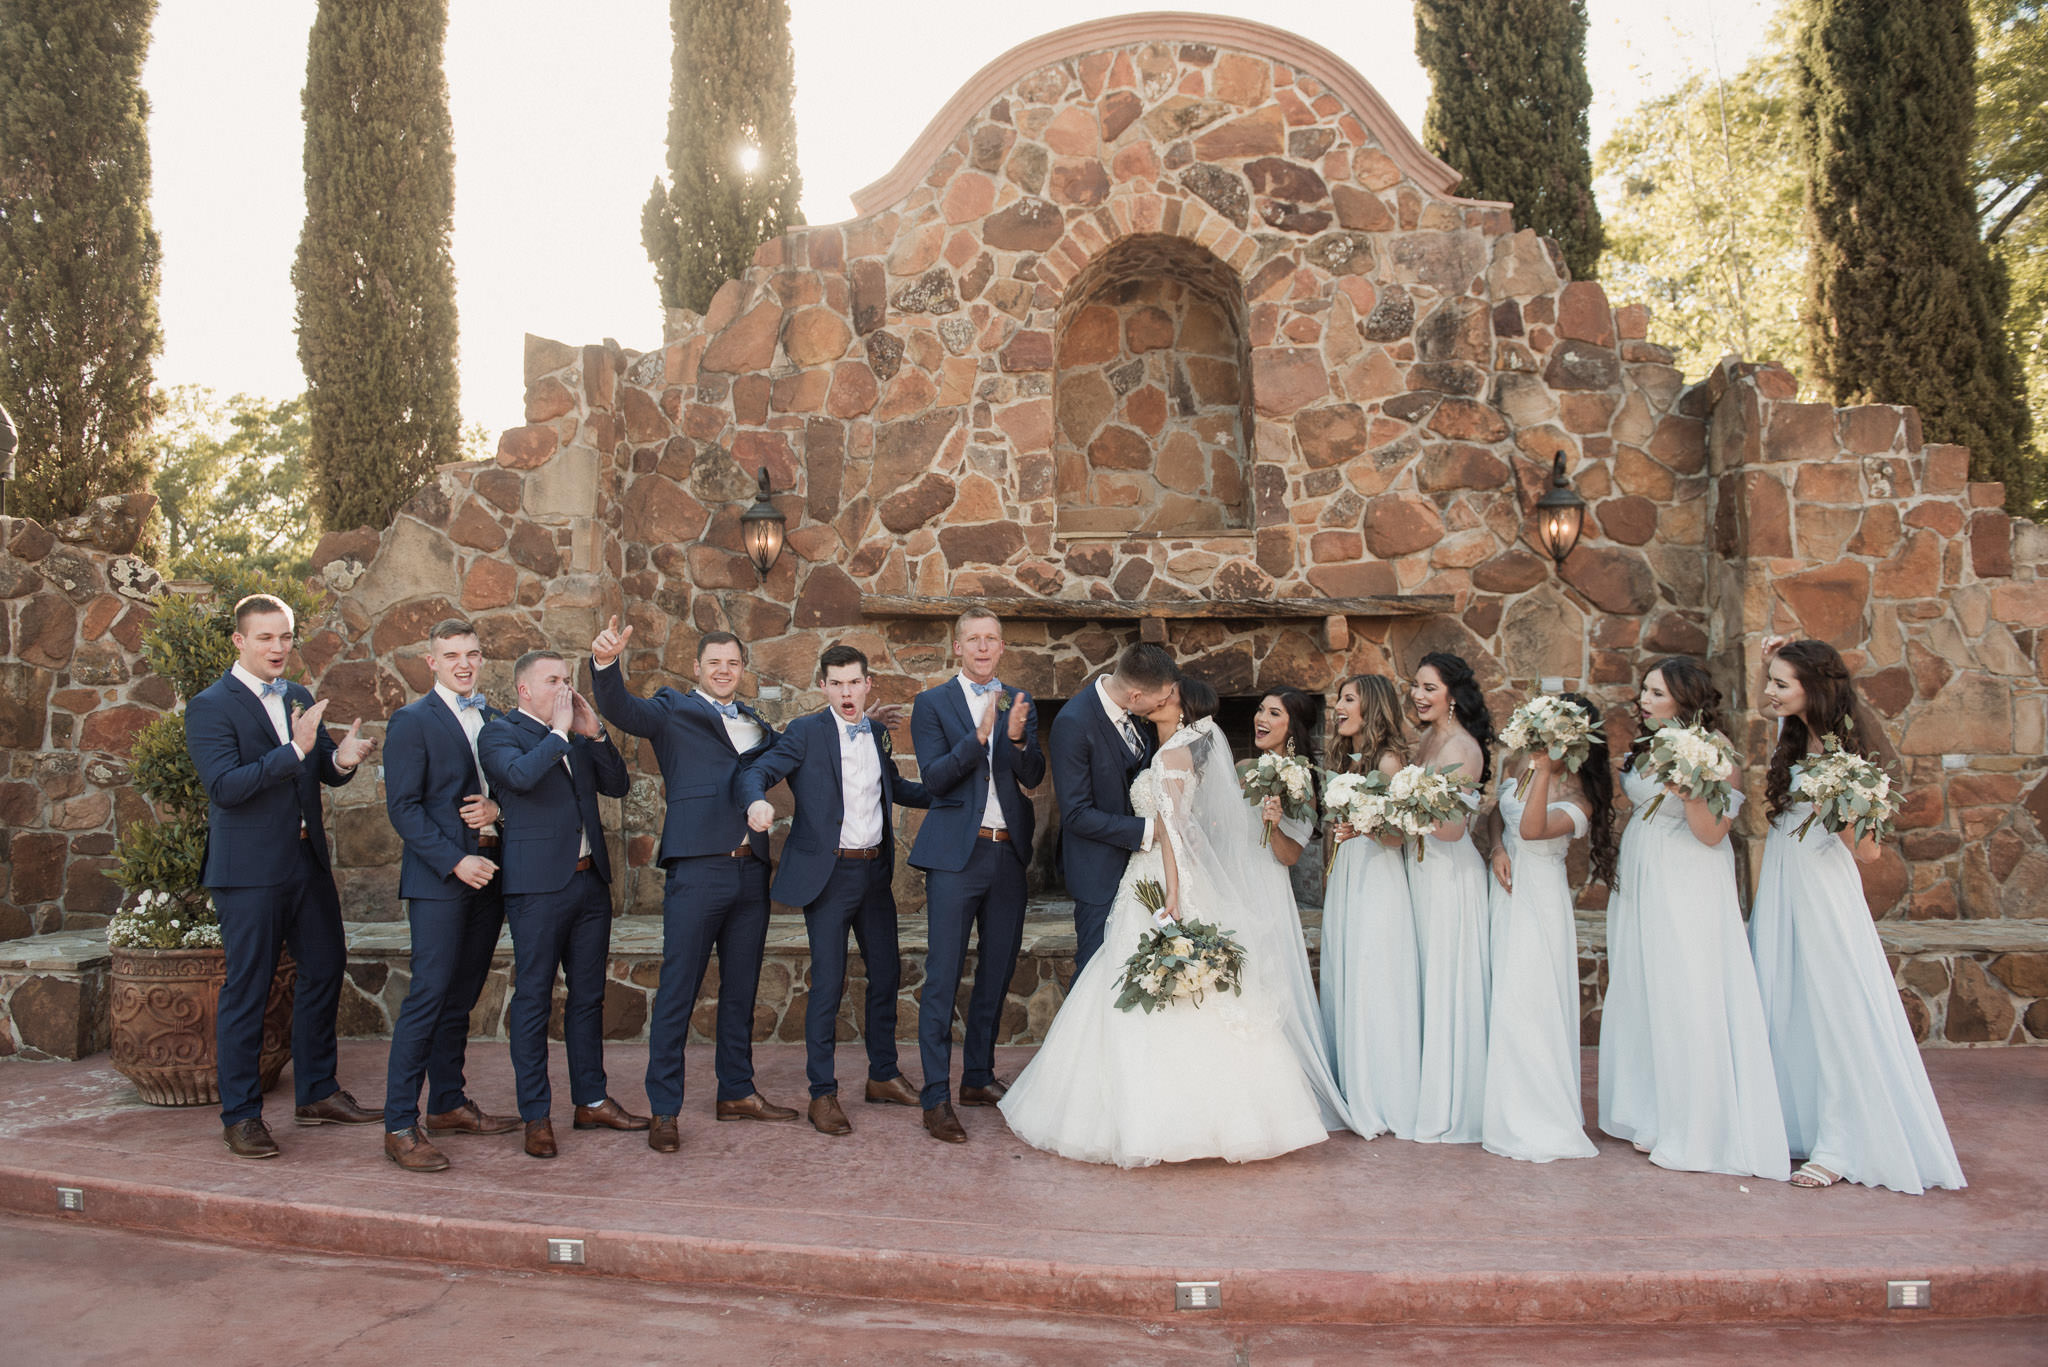 adriana-christian-wedding-re-sm-93.jpg